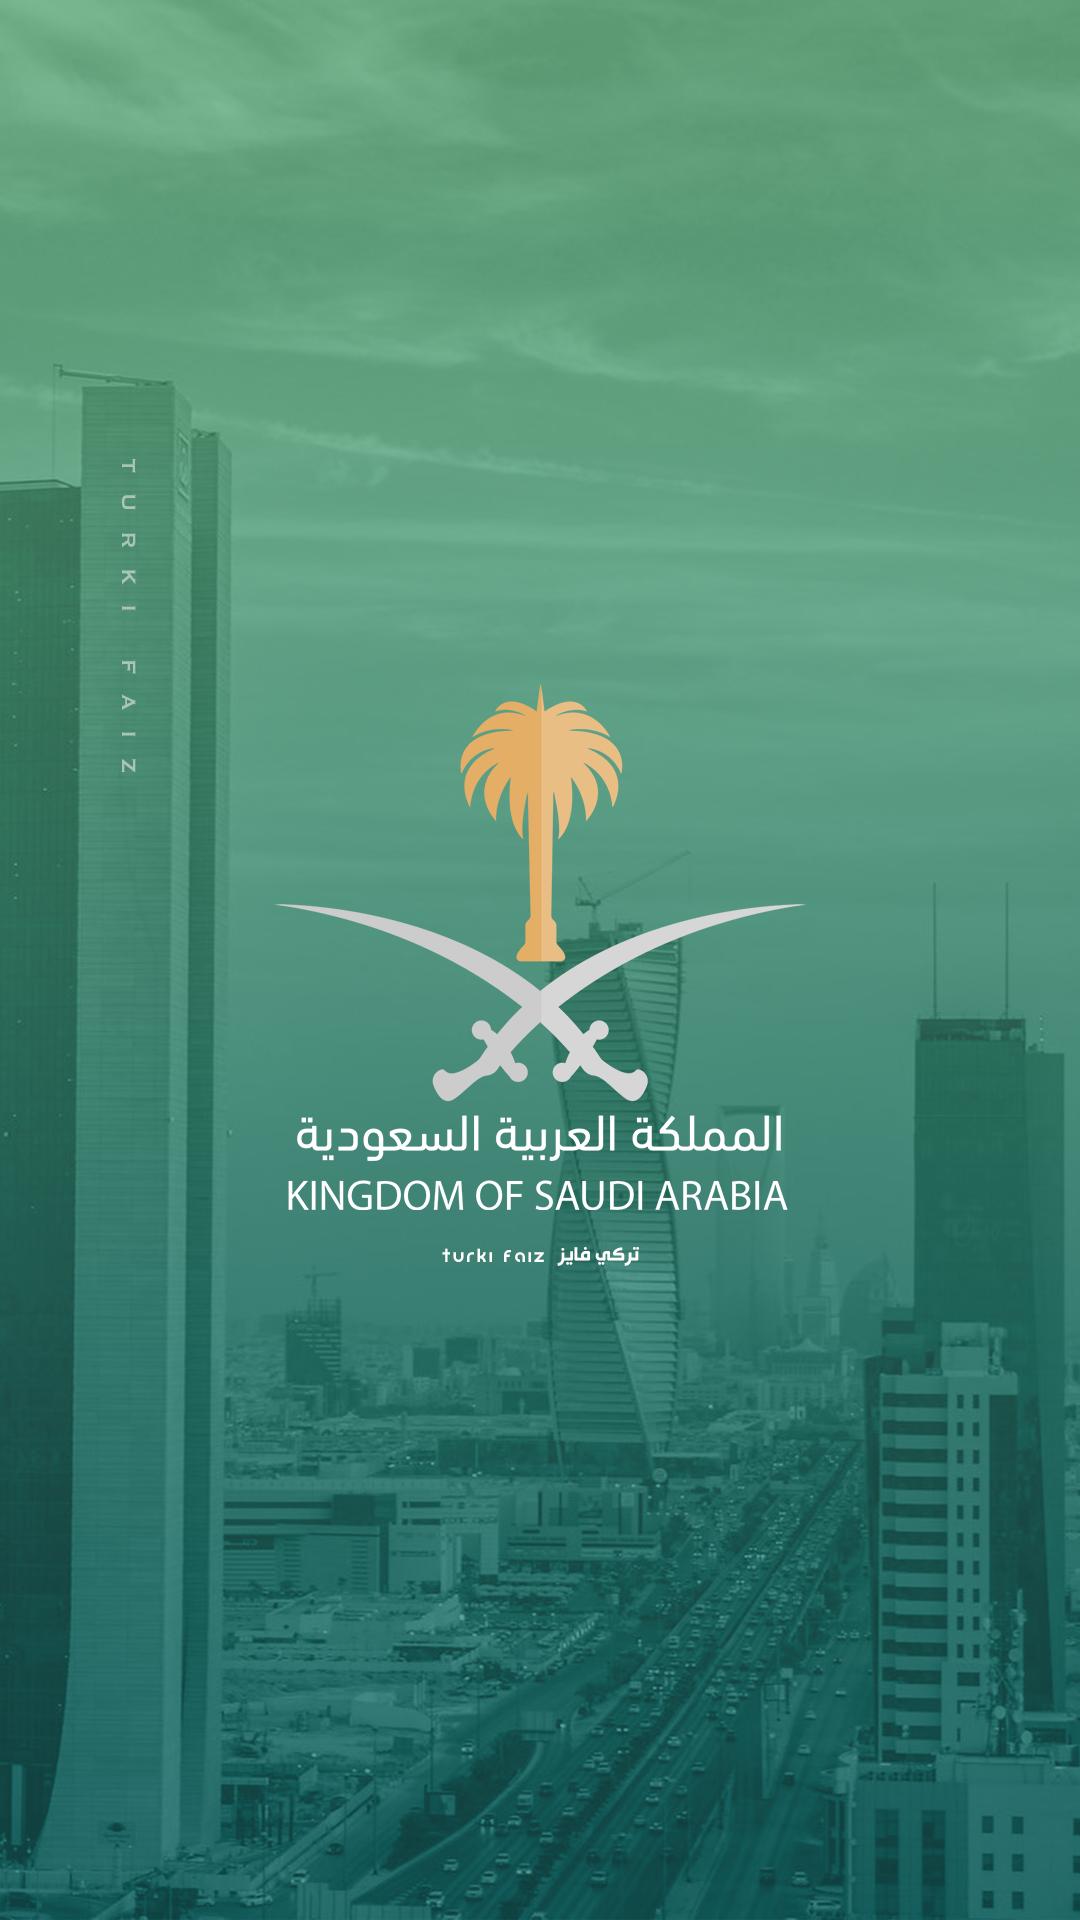 كل عام و وطني بخير Saudi Arabia Flag King Salman Saudi Arabia Saudi Flag